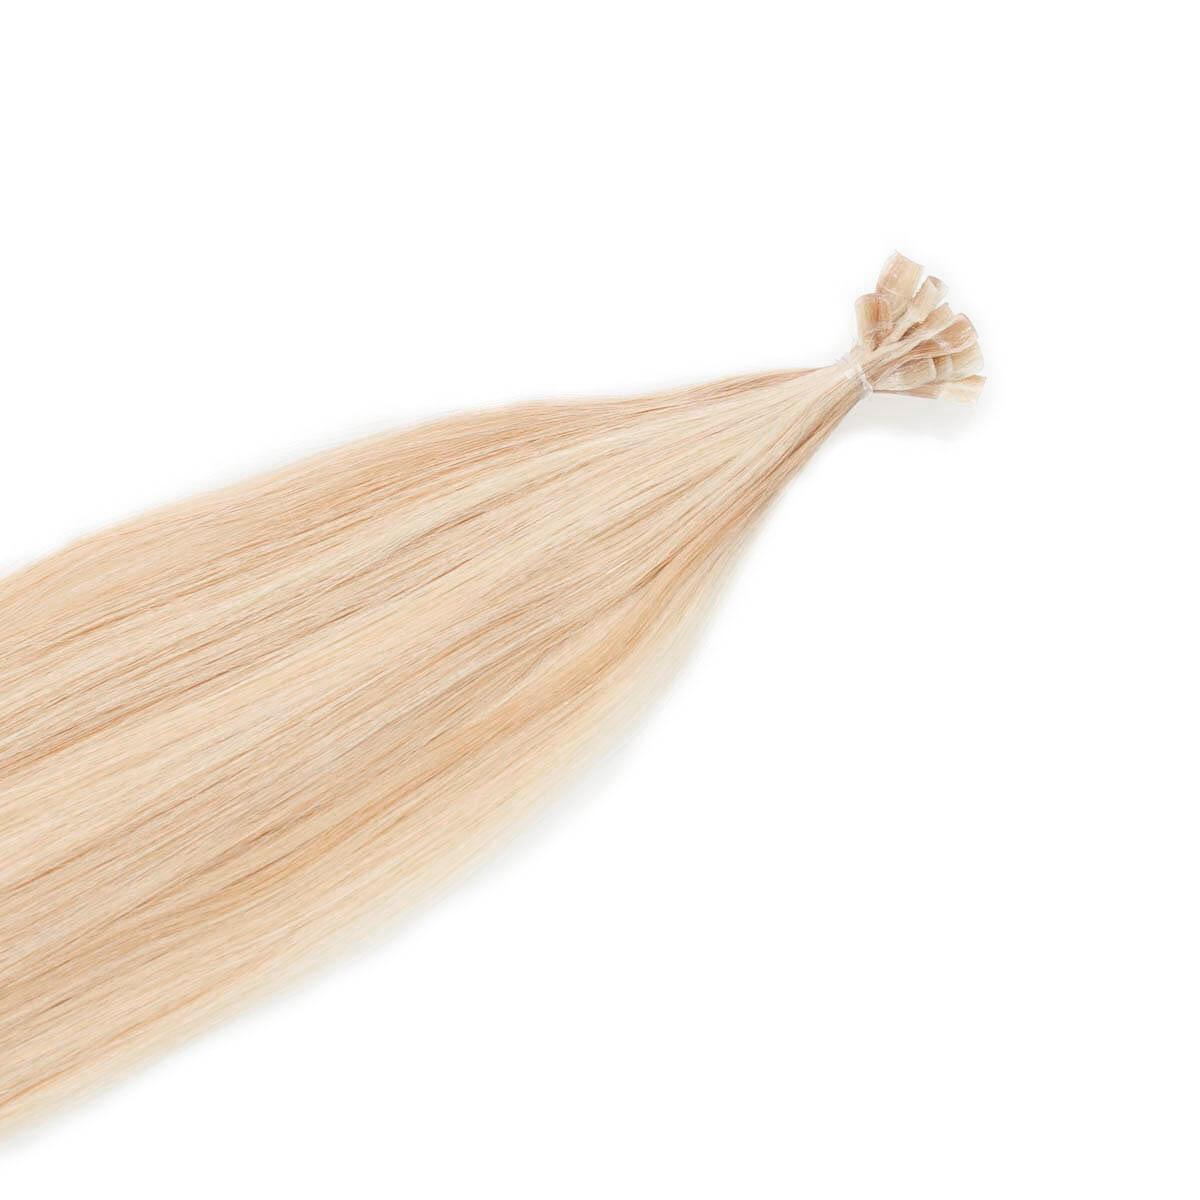 Nail Hair Original M7.5/10.8 Scandinavian Blonde Mix 50 cm